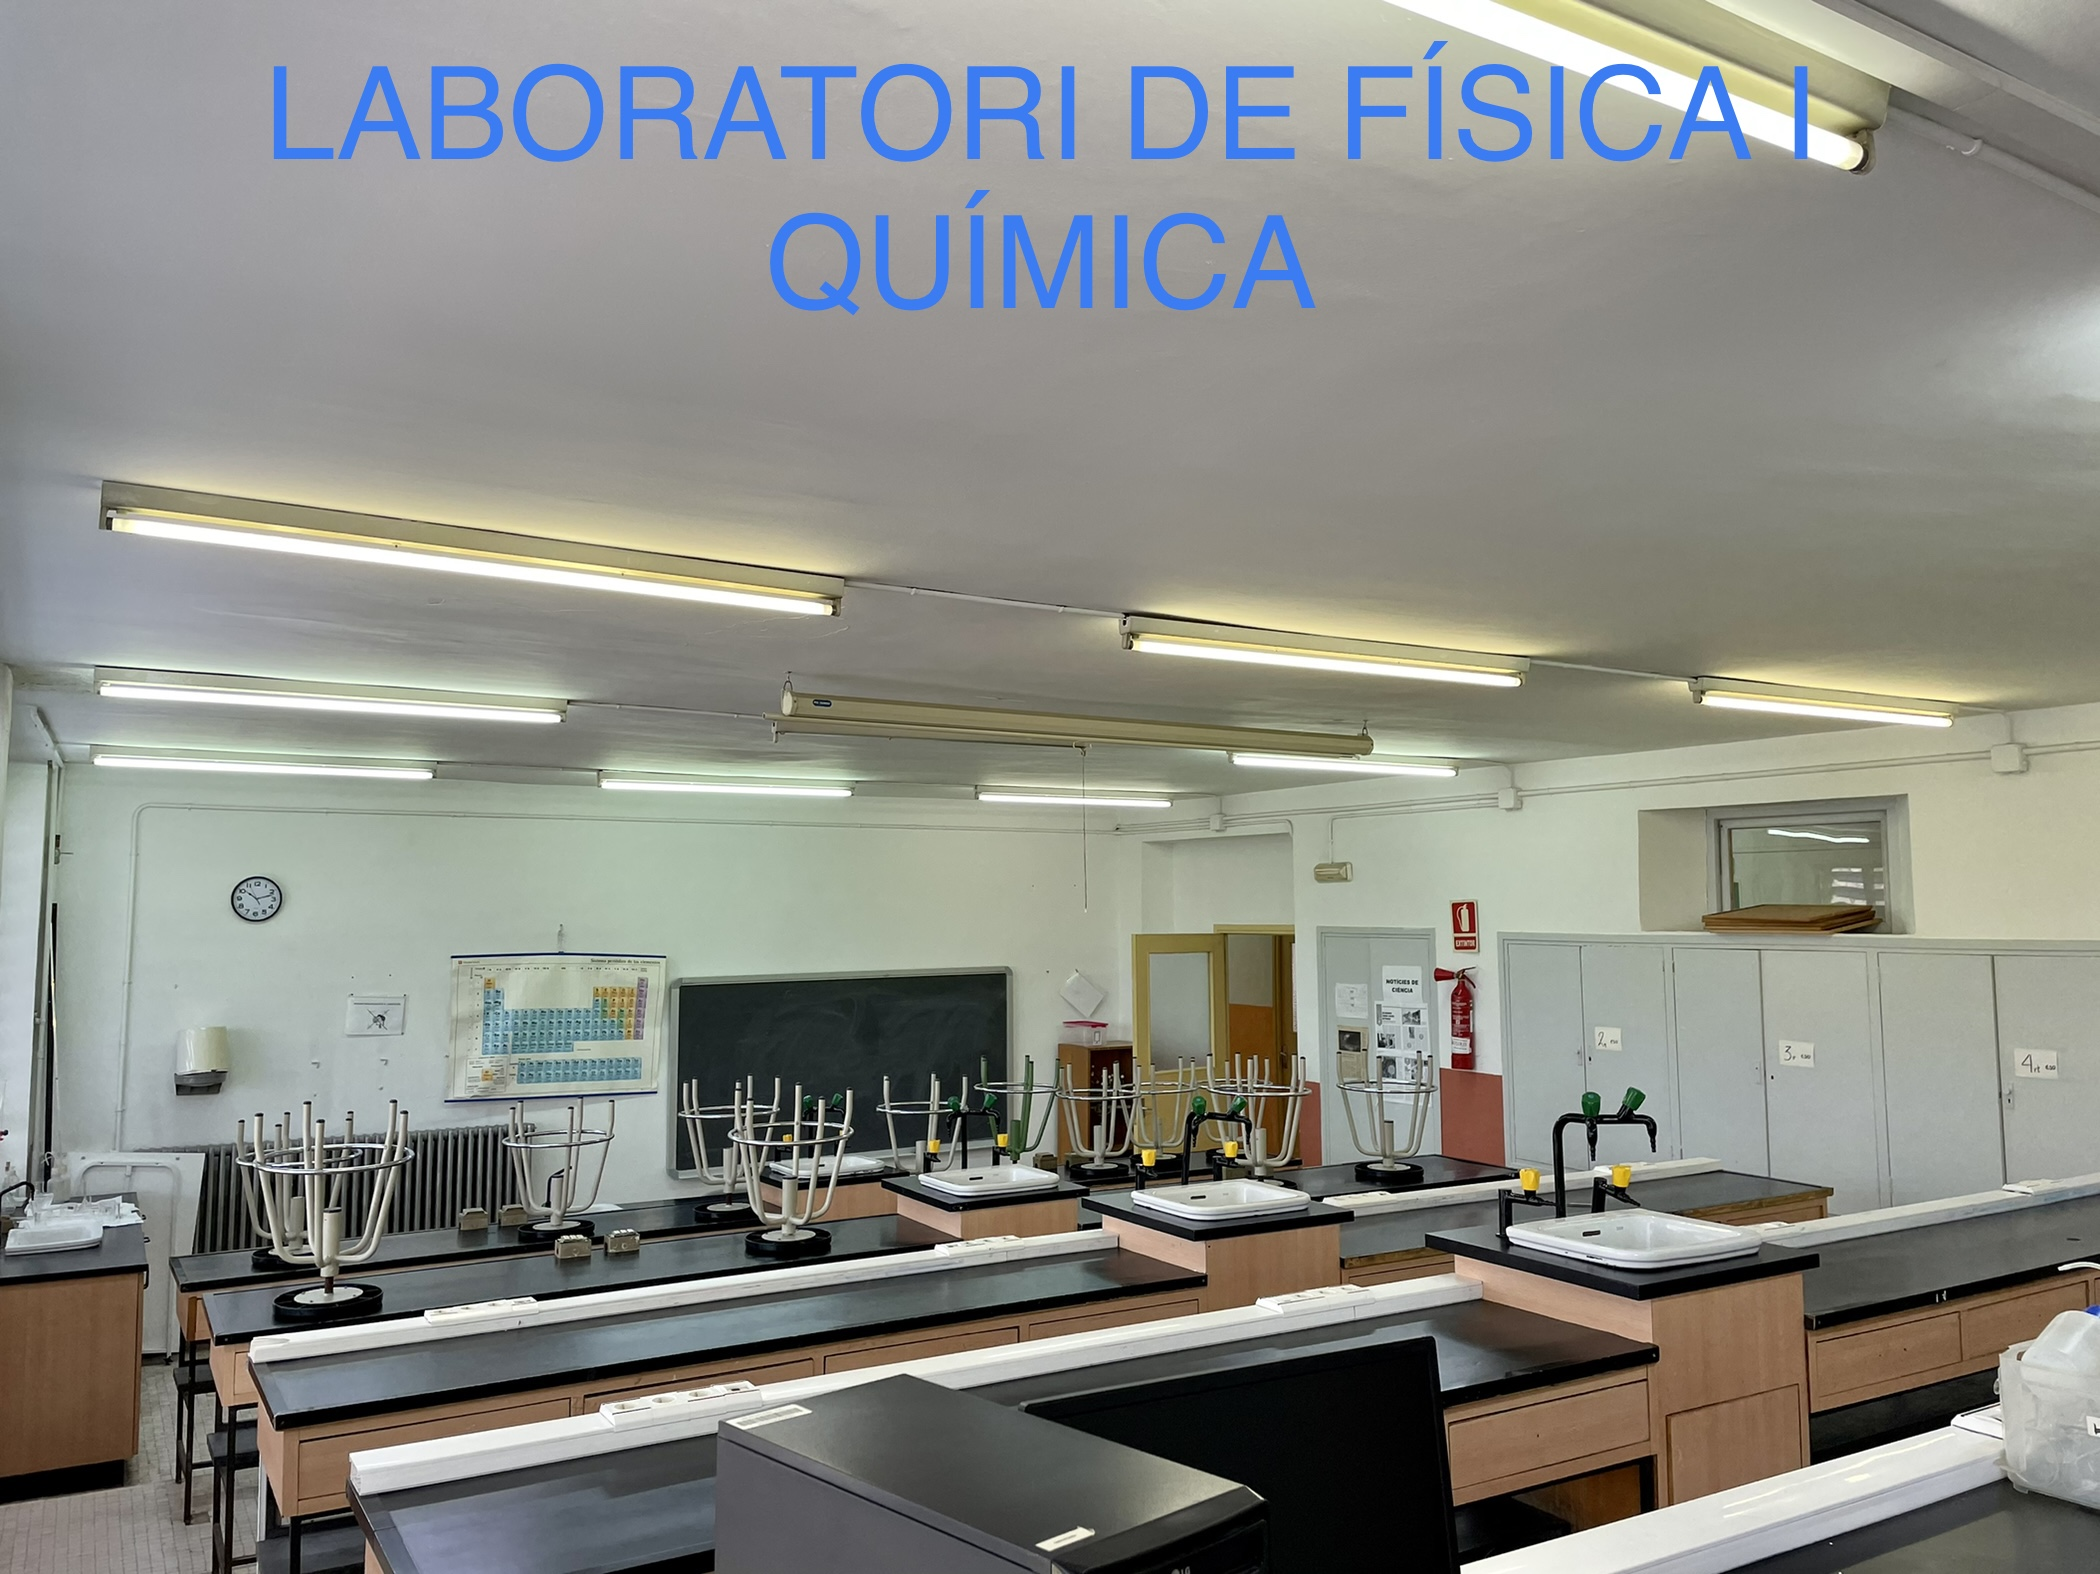 Laboratori de física i química